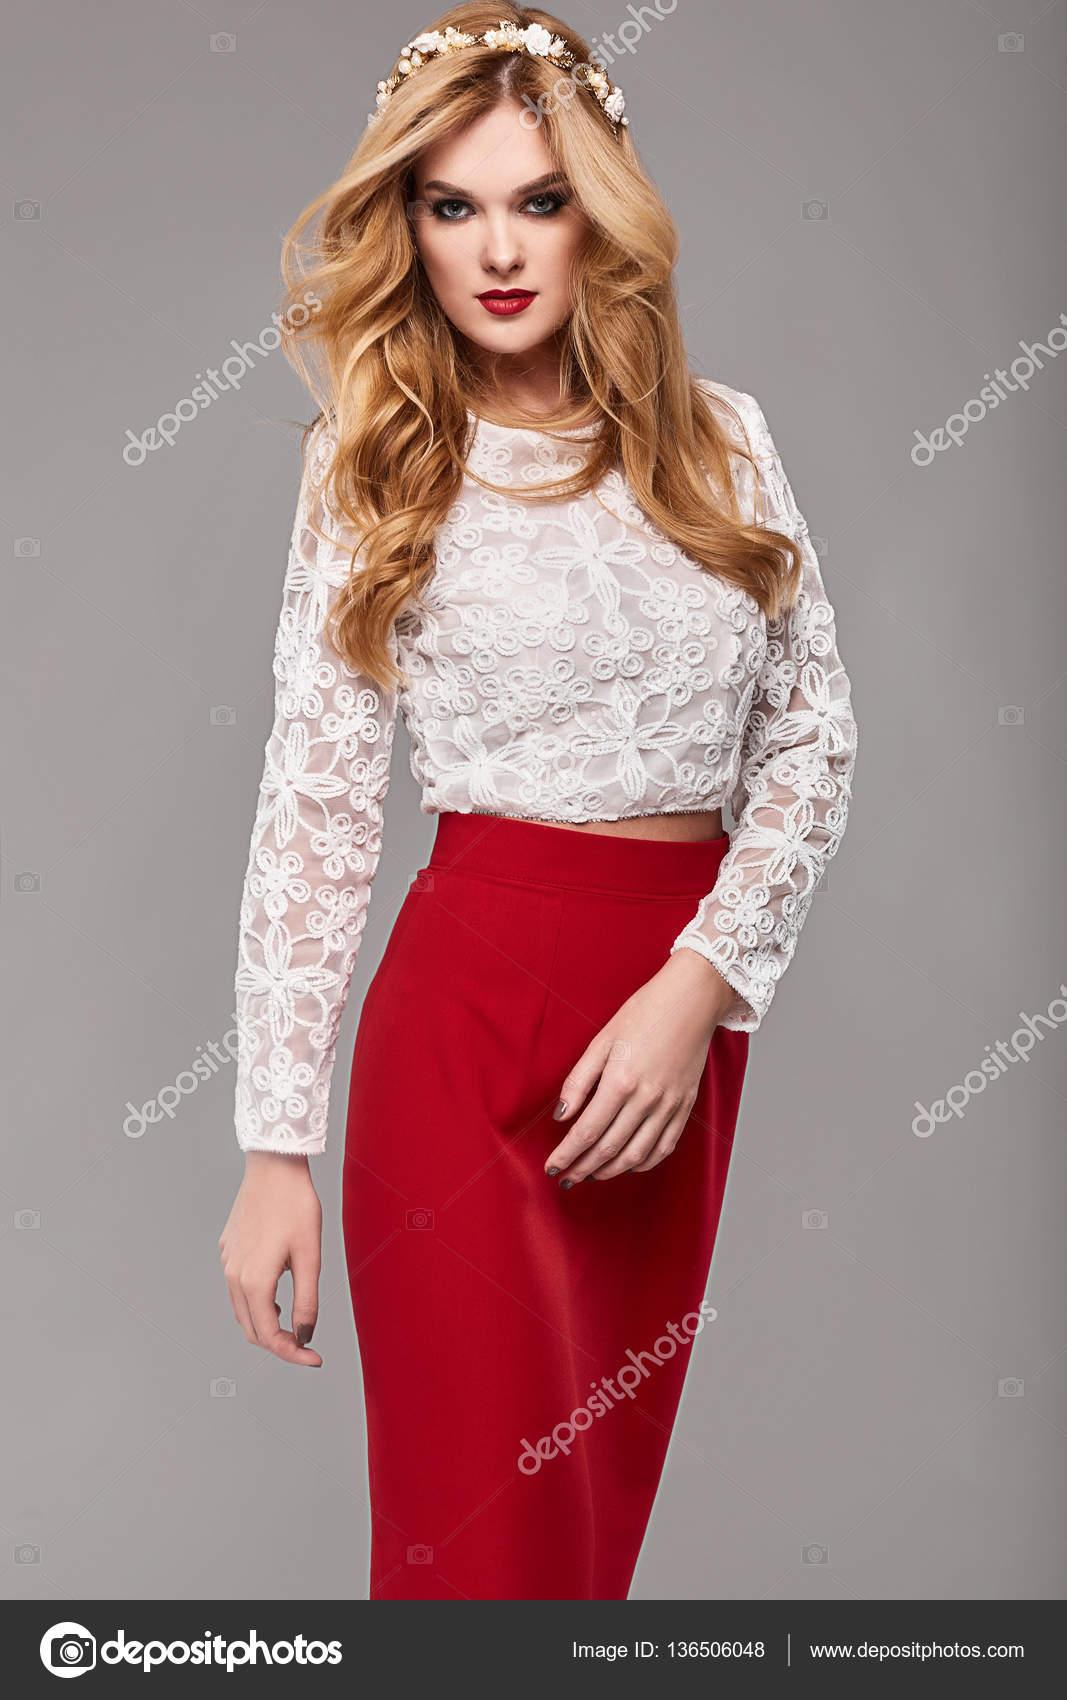 46956f0b5e8df Hermosa mujer elegante moda vestido rojo y blanco — Foto de Stock